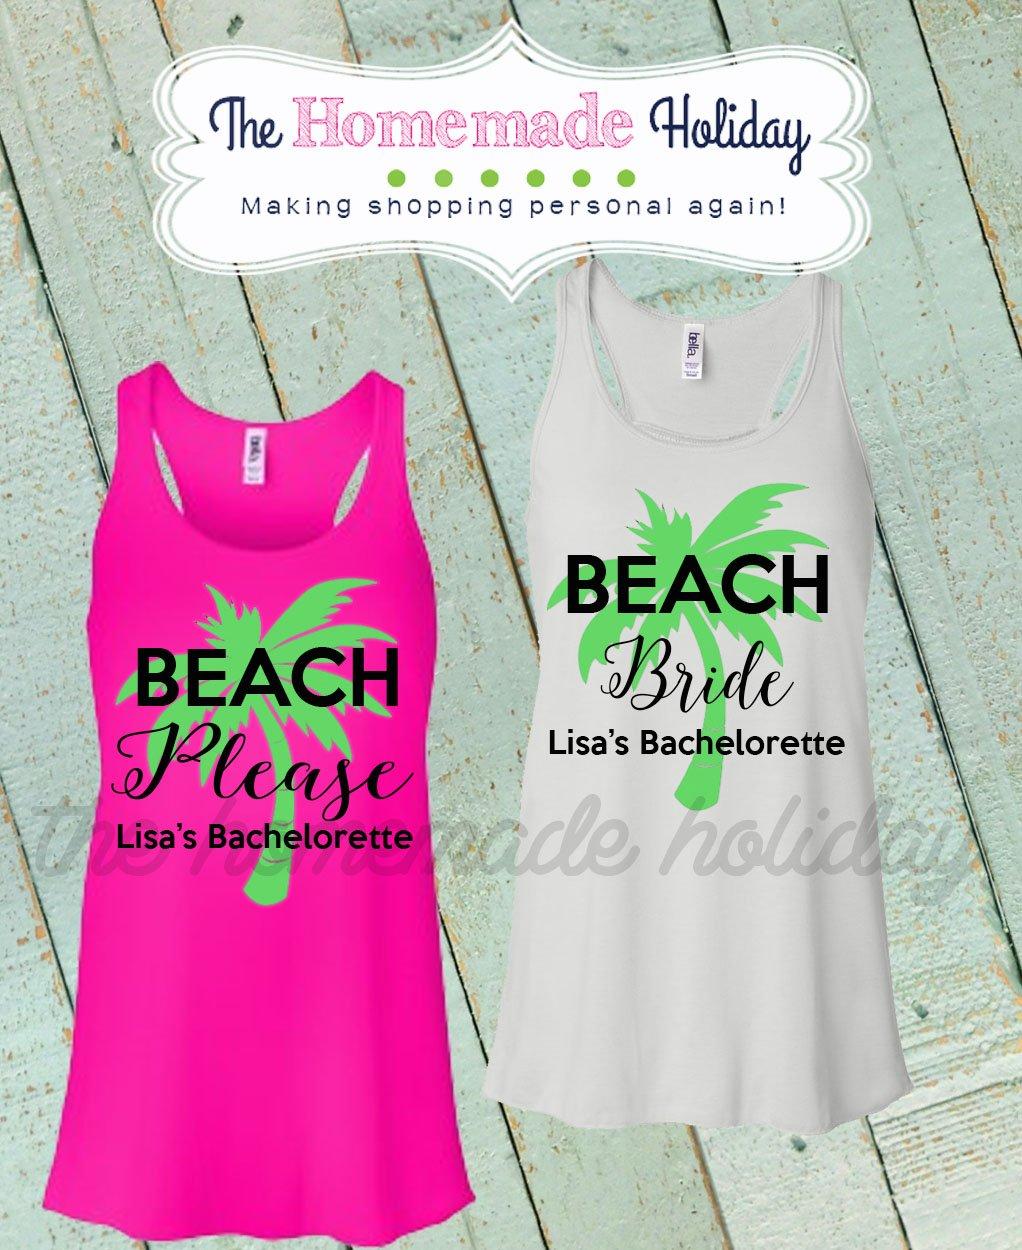 f3058336cf Amazon.com  Beach Please Bachelorette Tank tops- bridal party shirts- palm  tree tank tops  Handmade